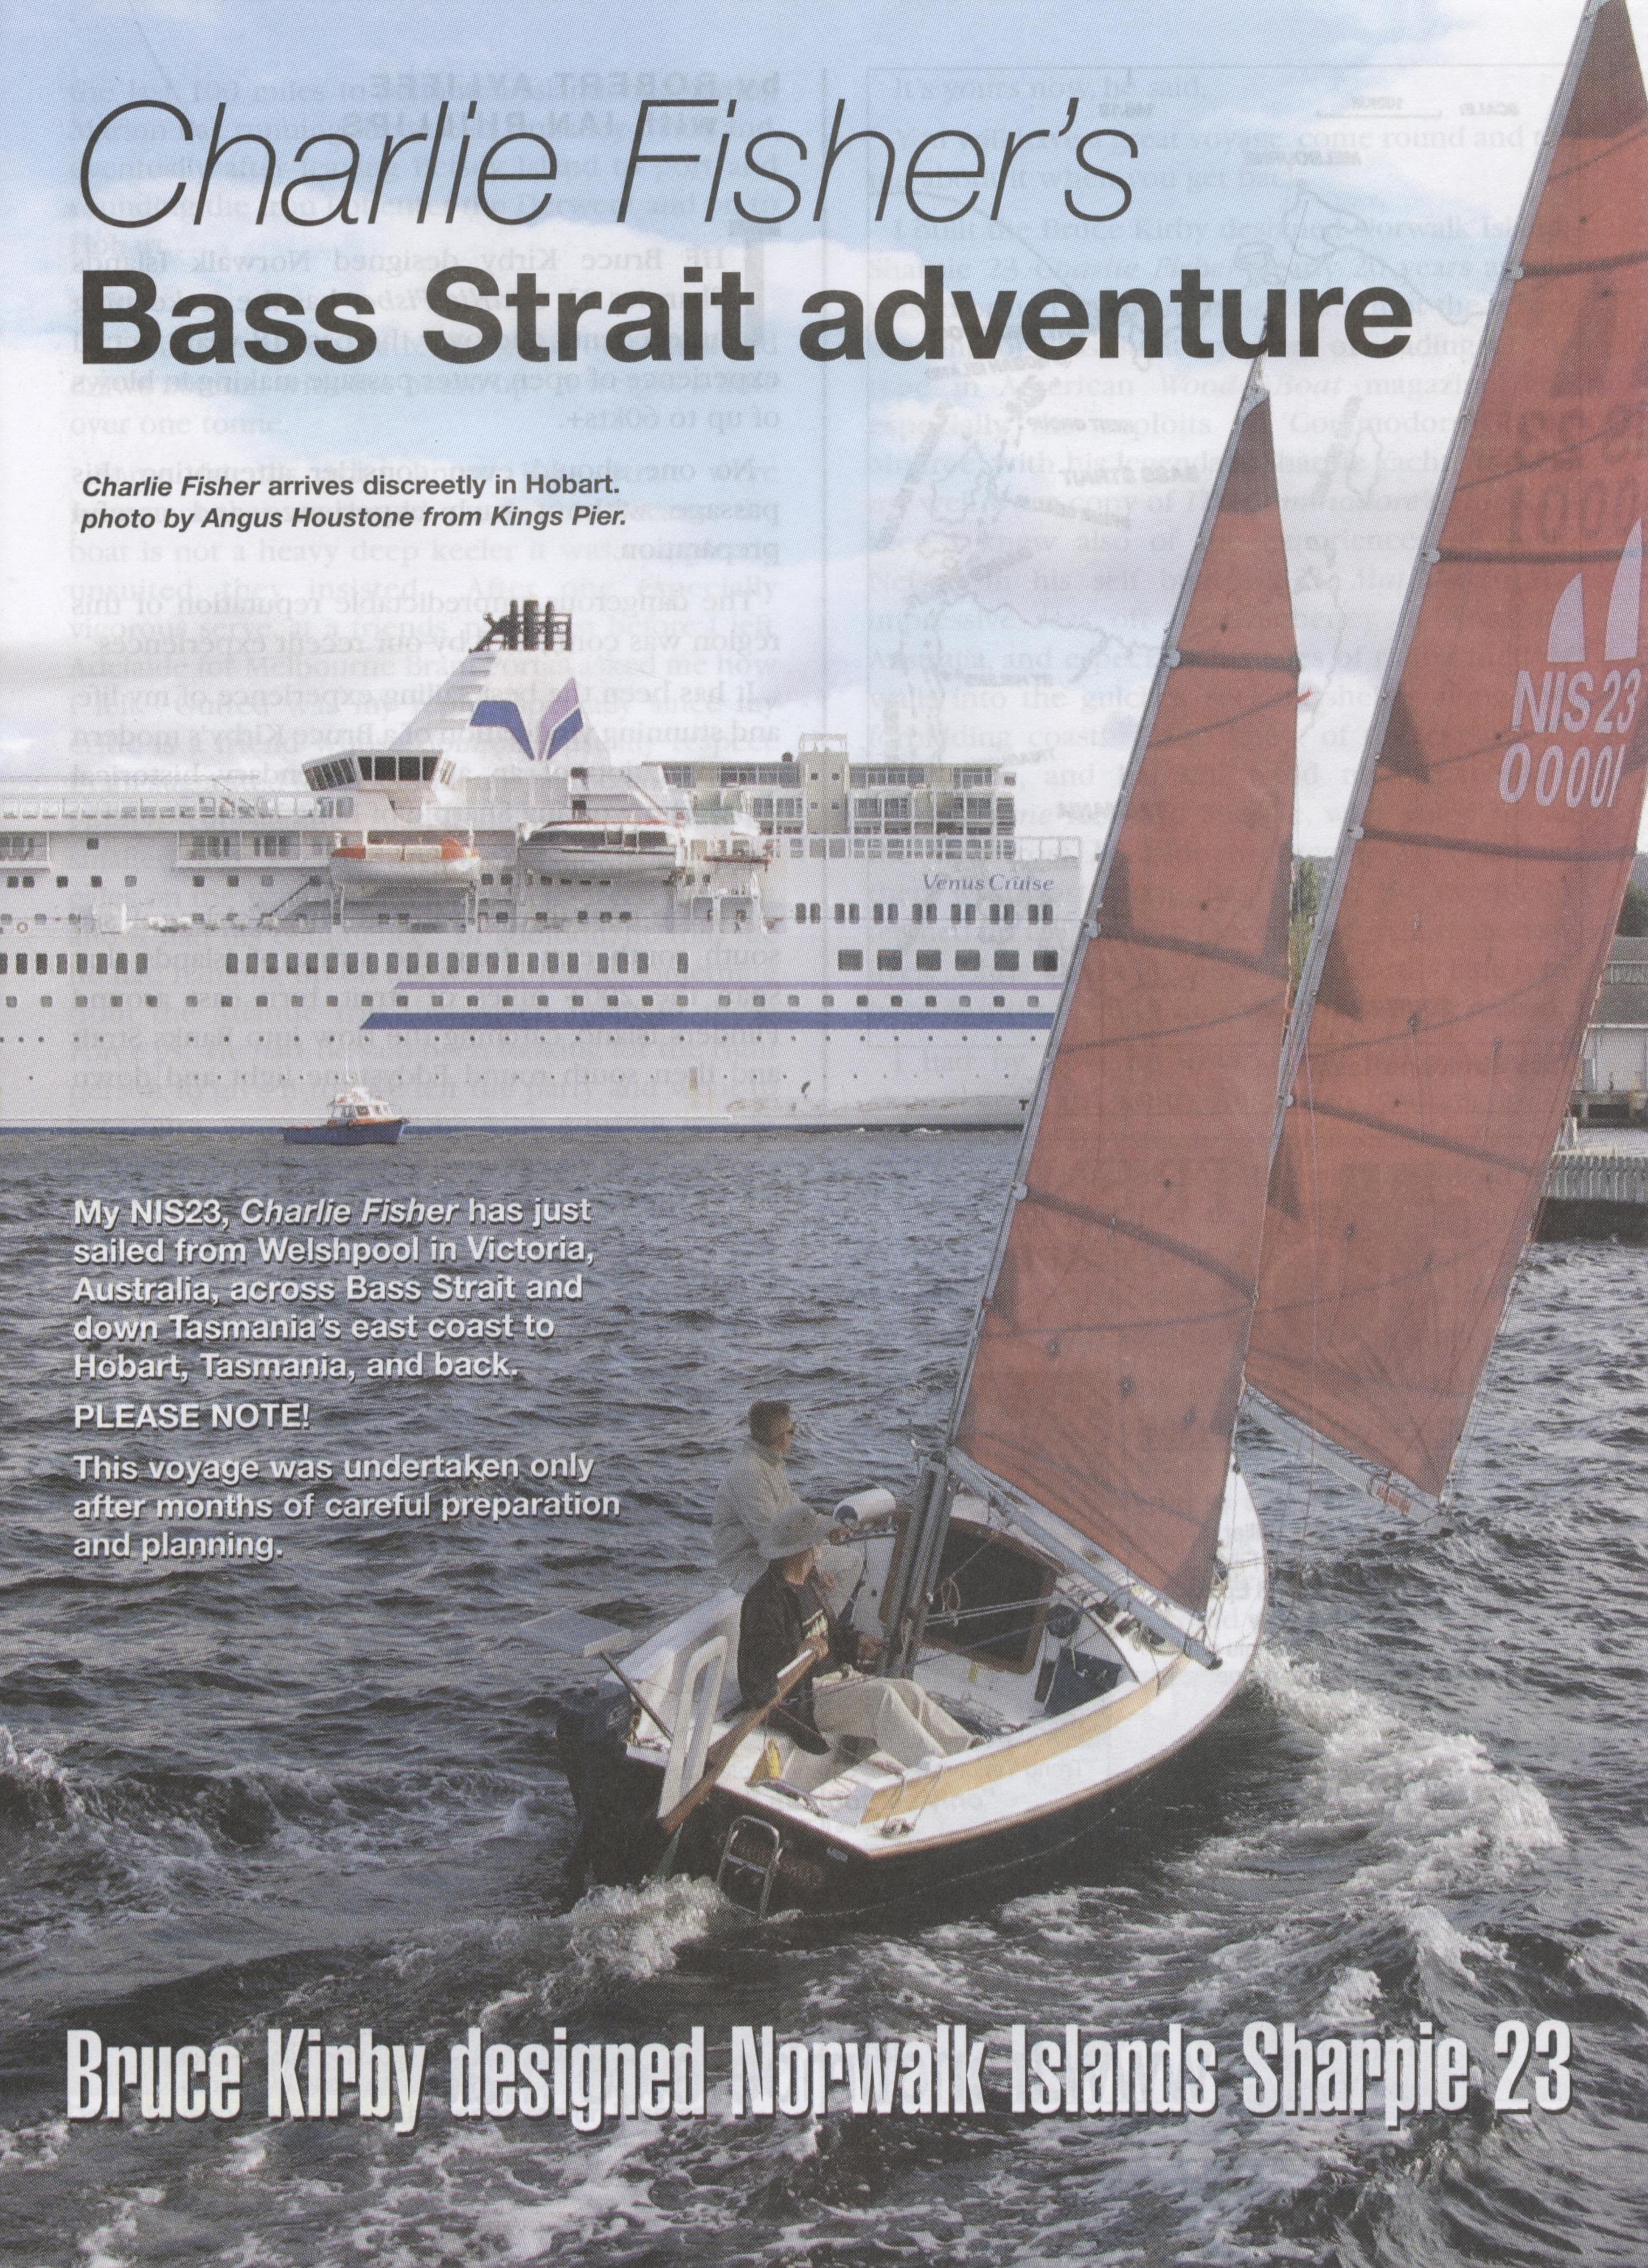 AABB-Charlie Fisher Bass Straight (1)